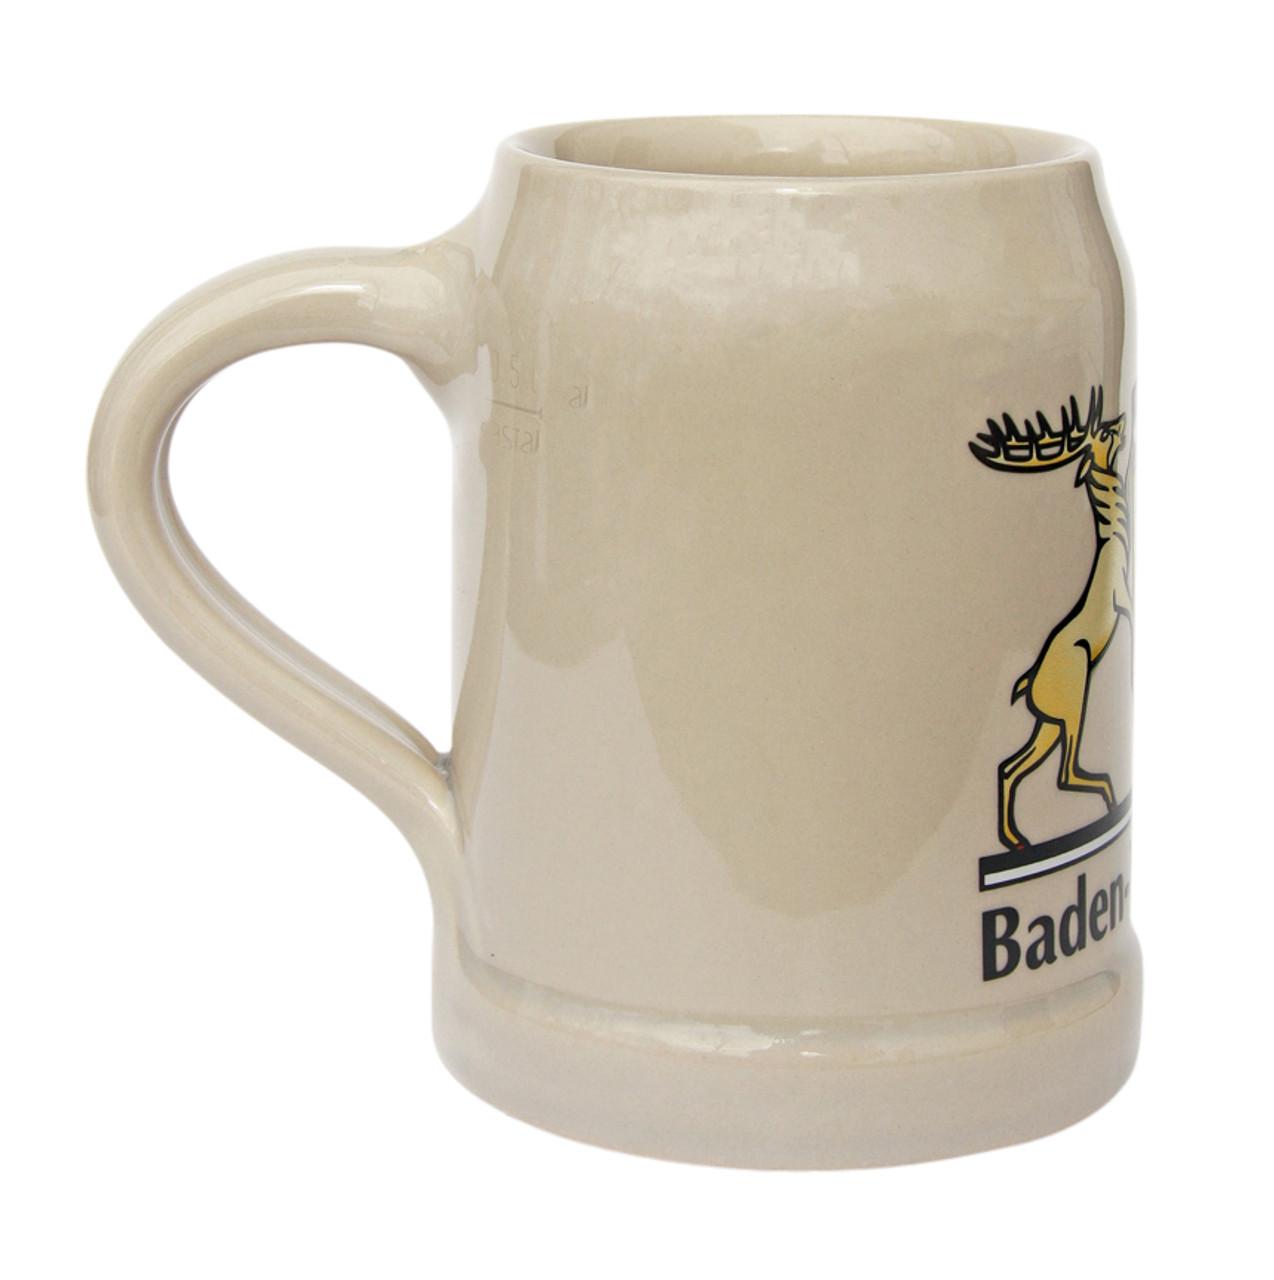 Baden Wuerttemberg Stoneware Beer Mug 0.5 Liter